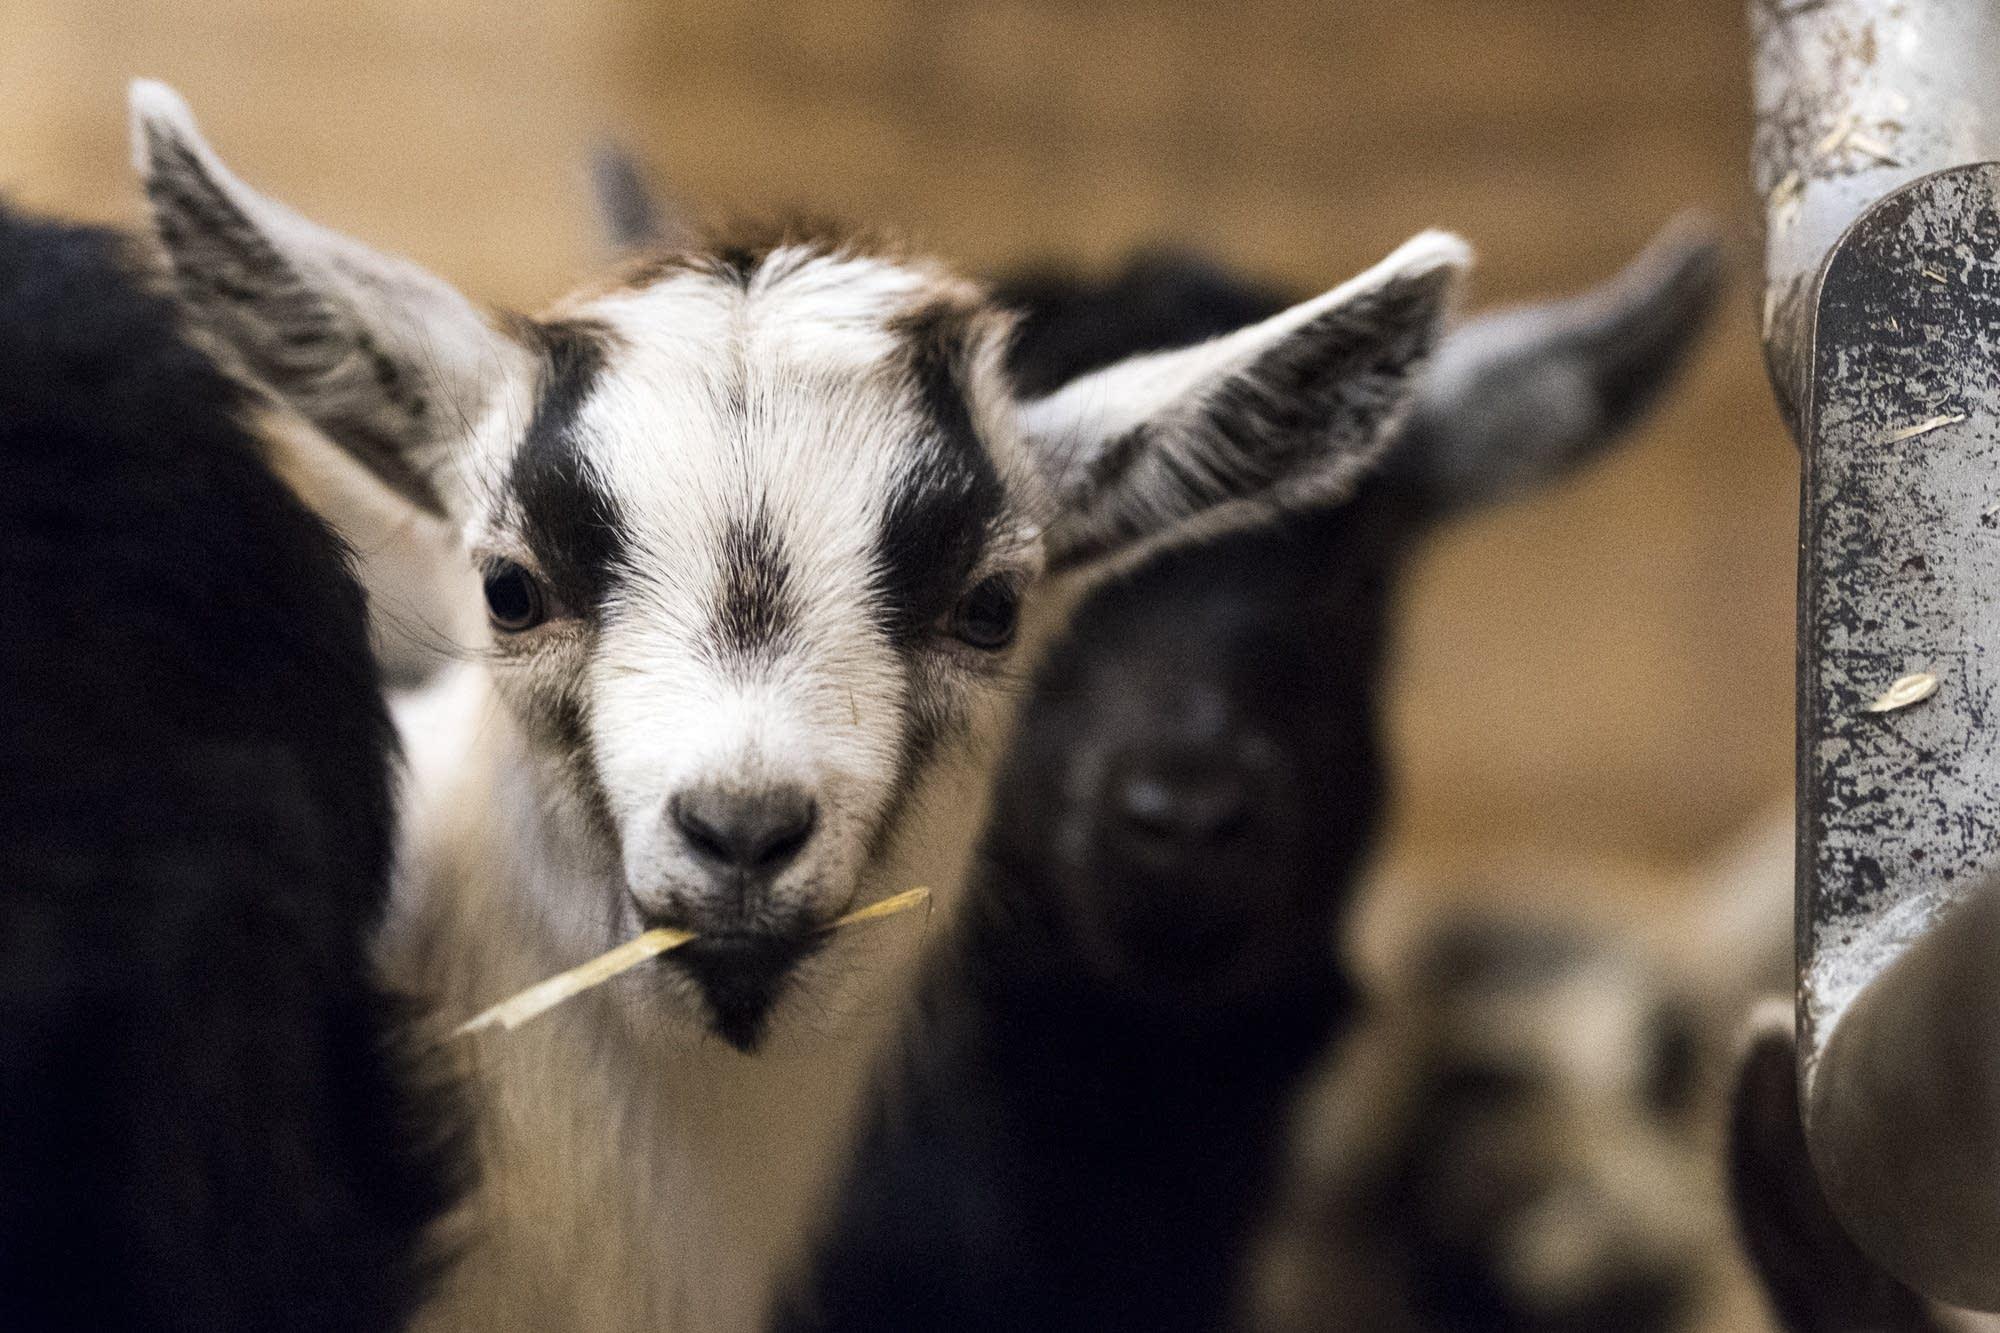 A goat kid chews straw.